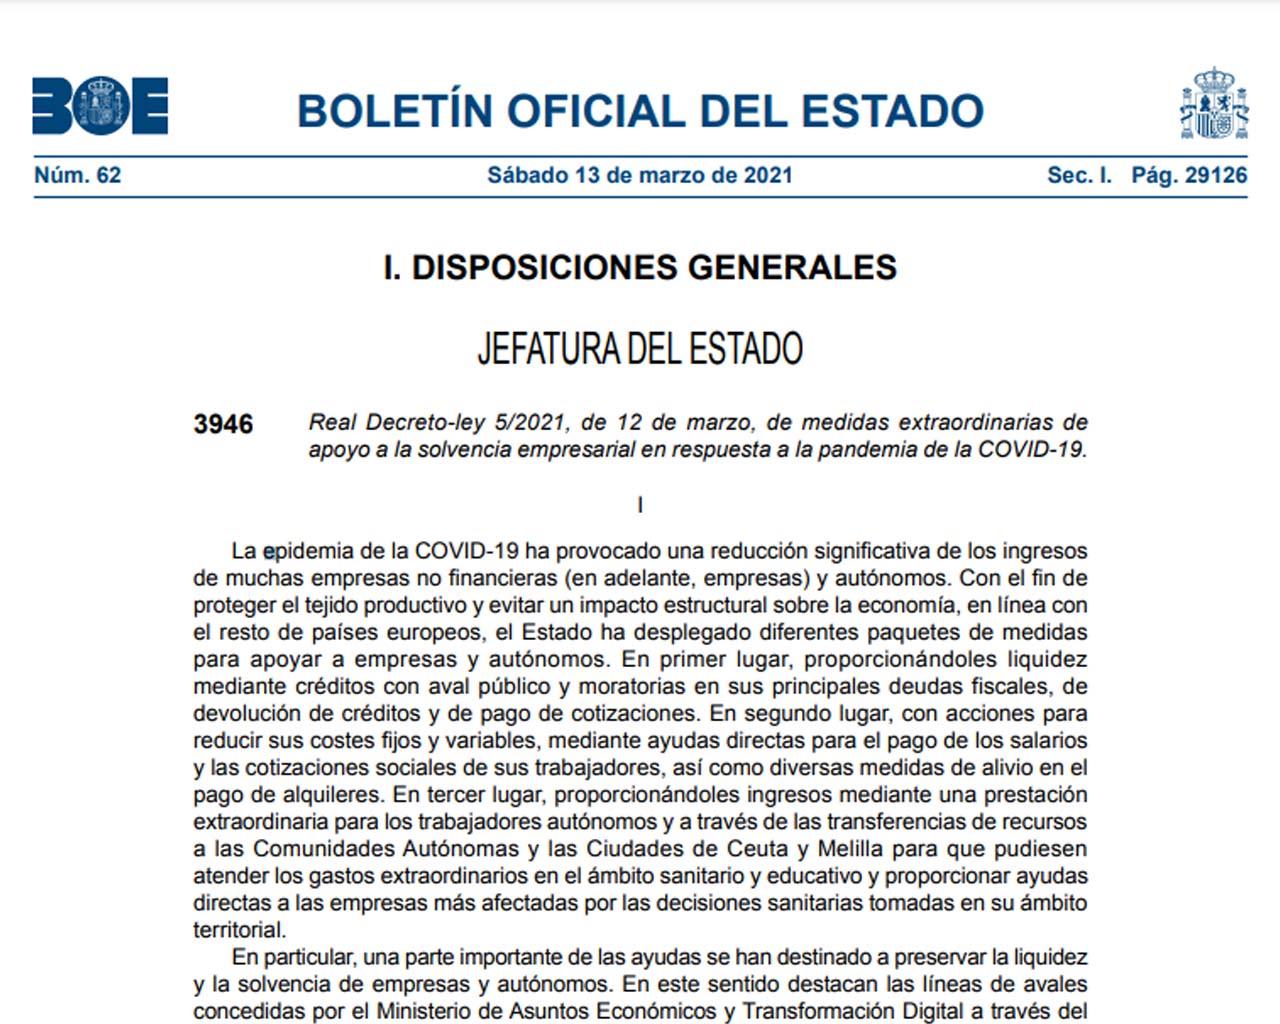 Real Decreto-ley 5/2021